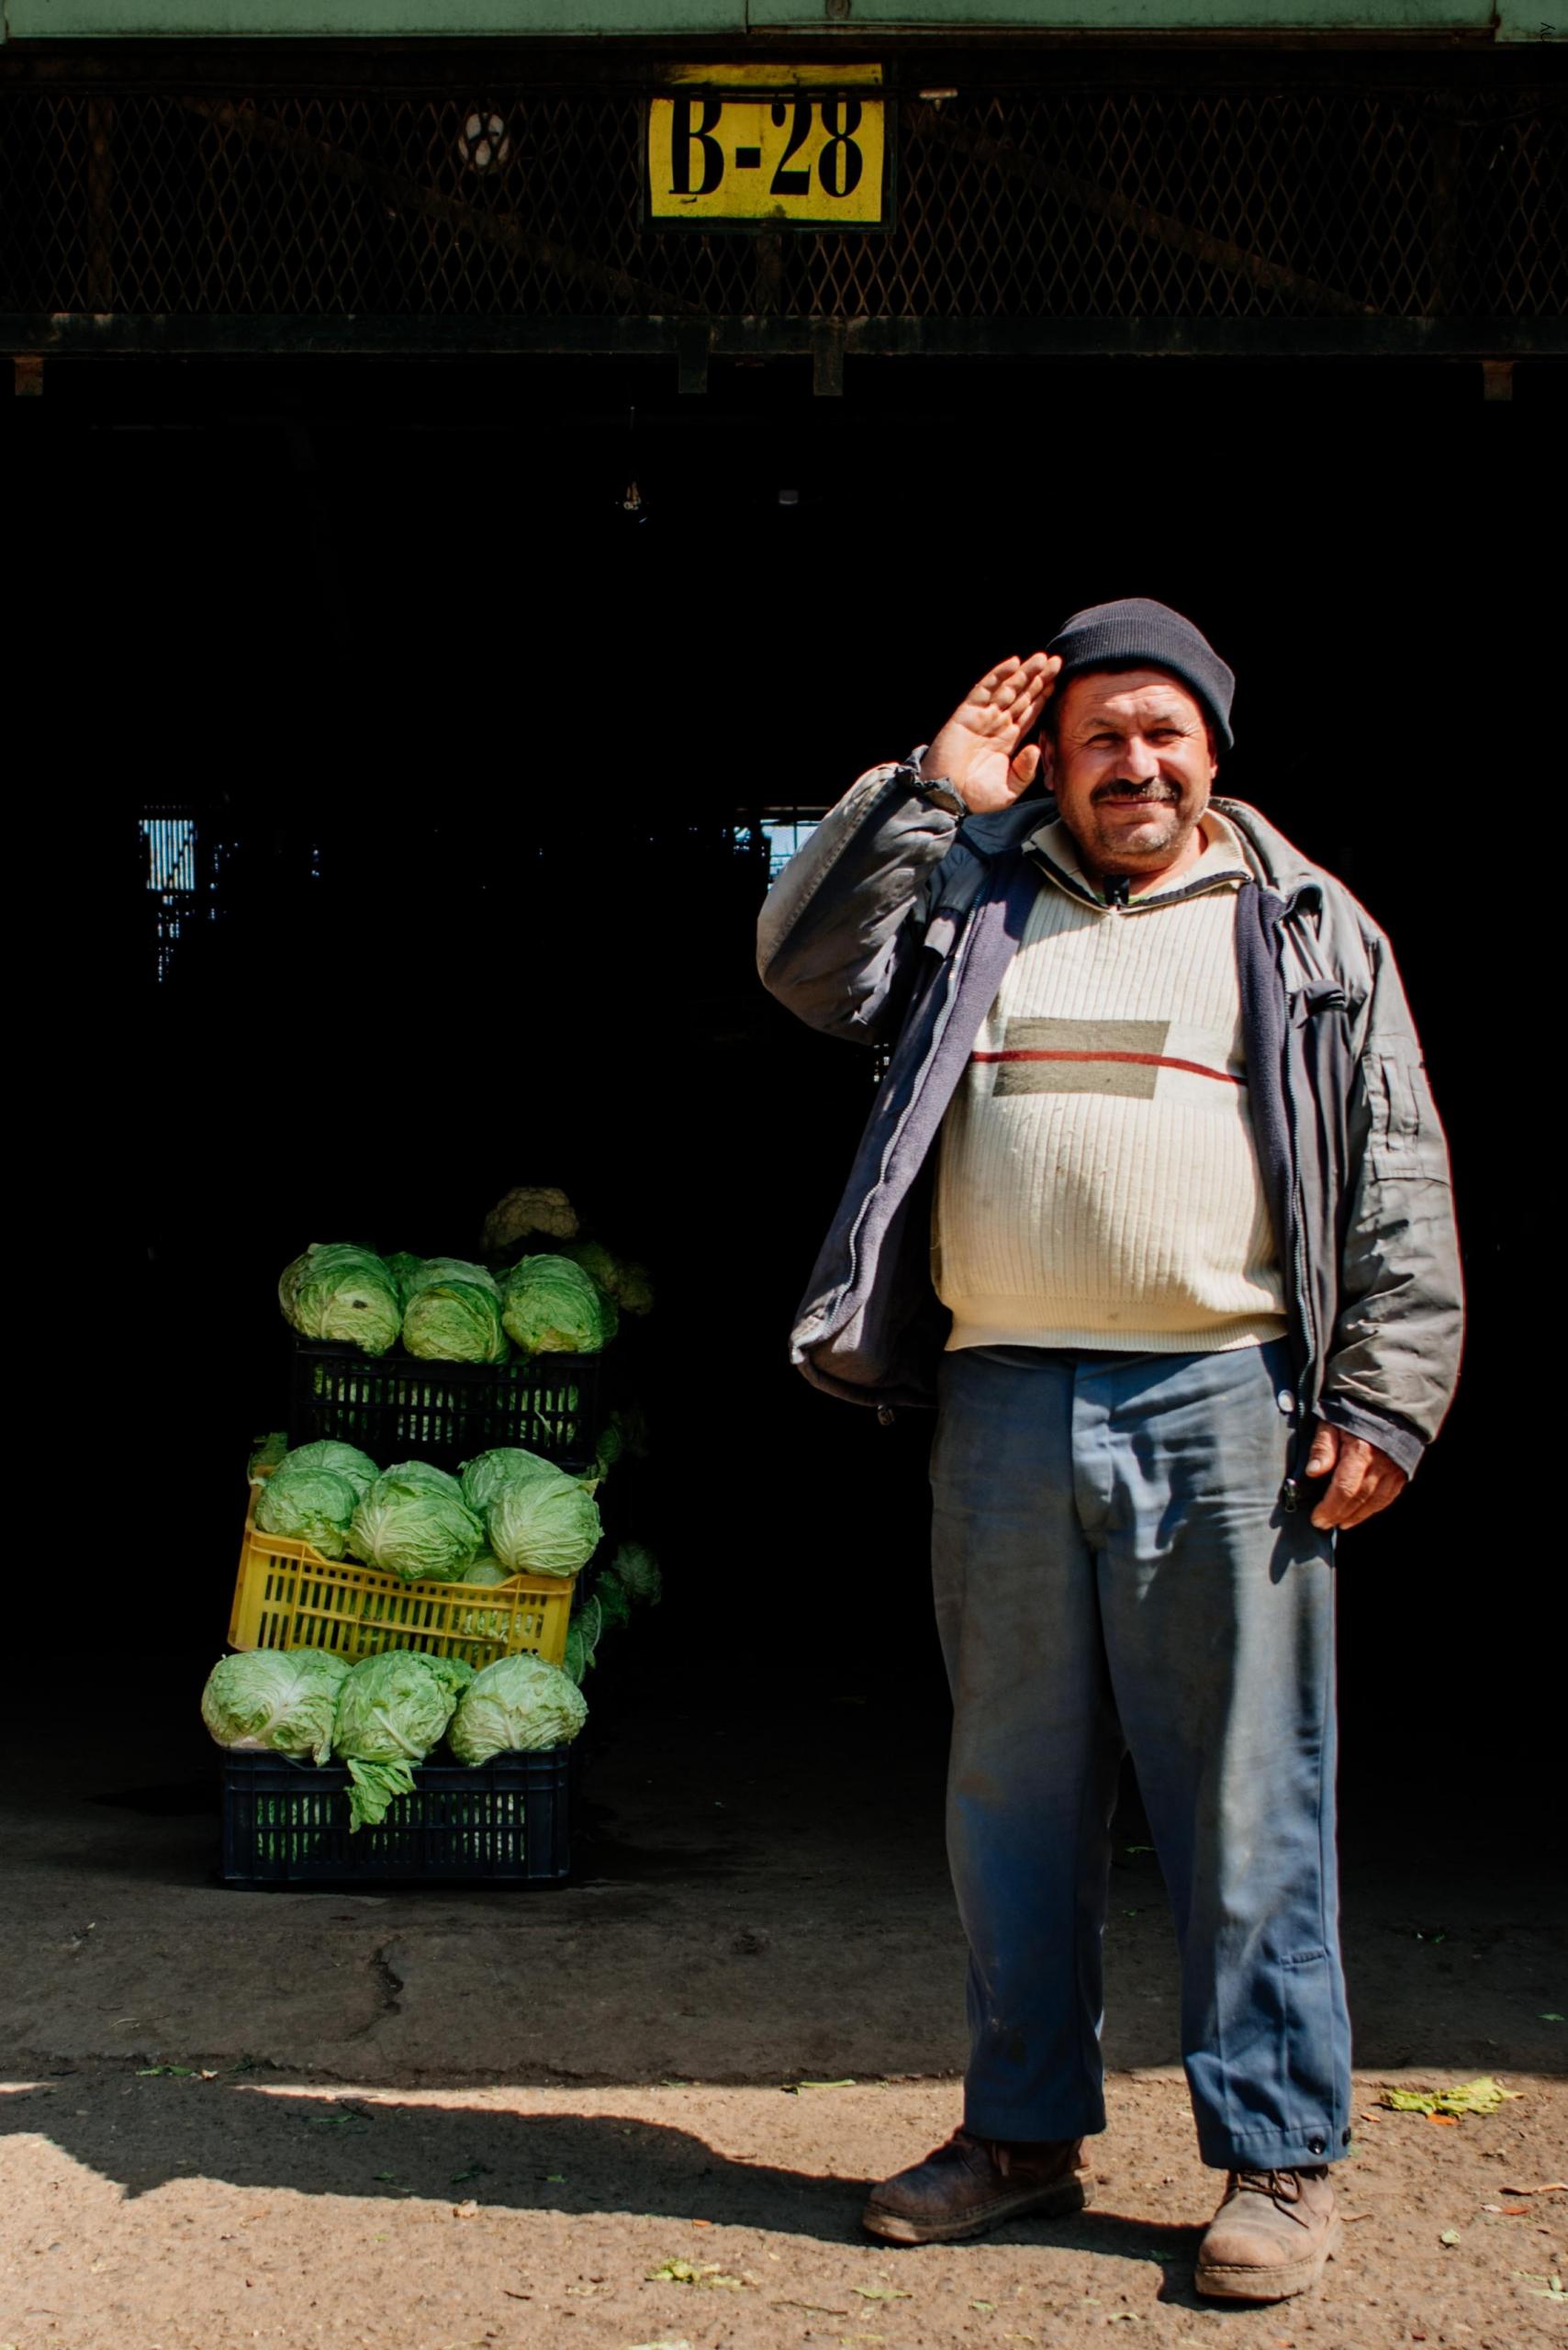 Une journée au marché d'Attatba - One day in Attatba wholesale market